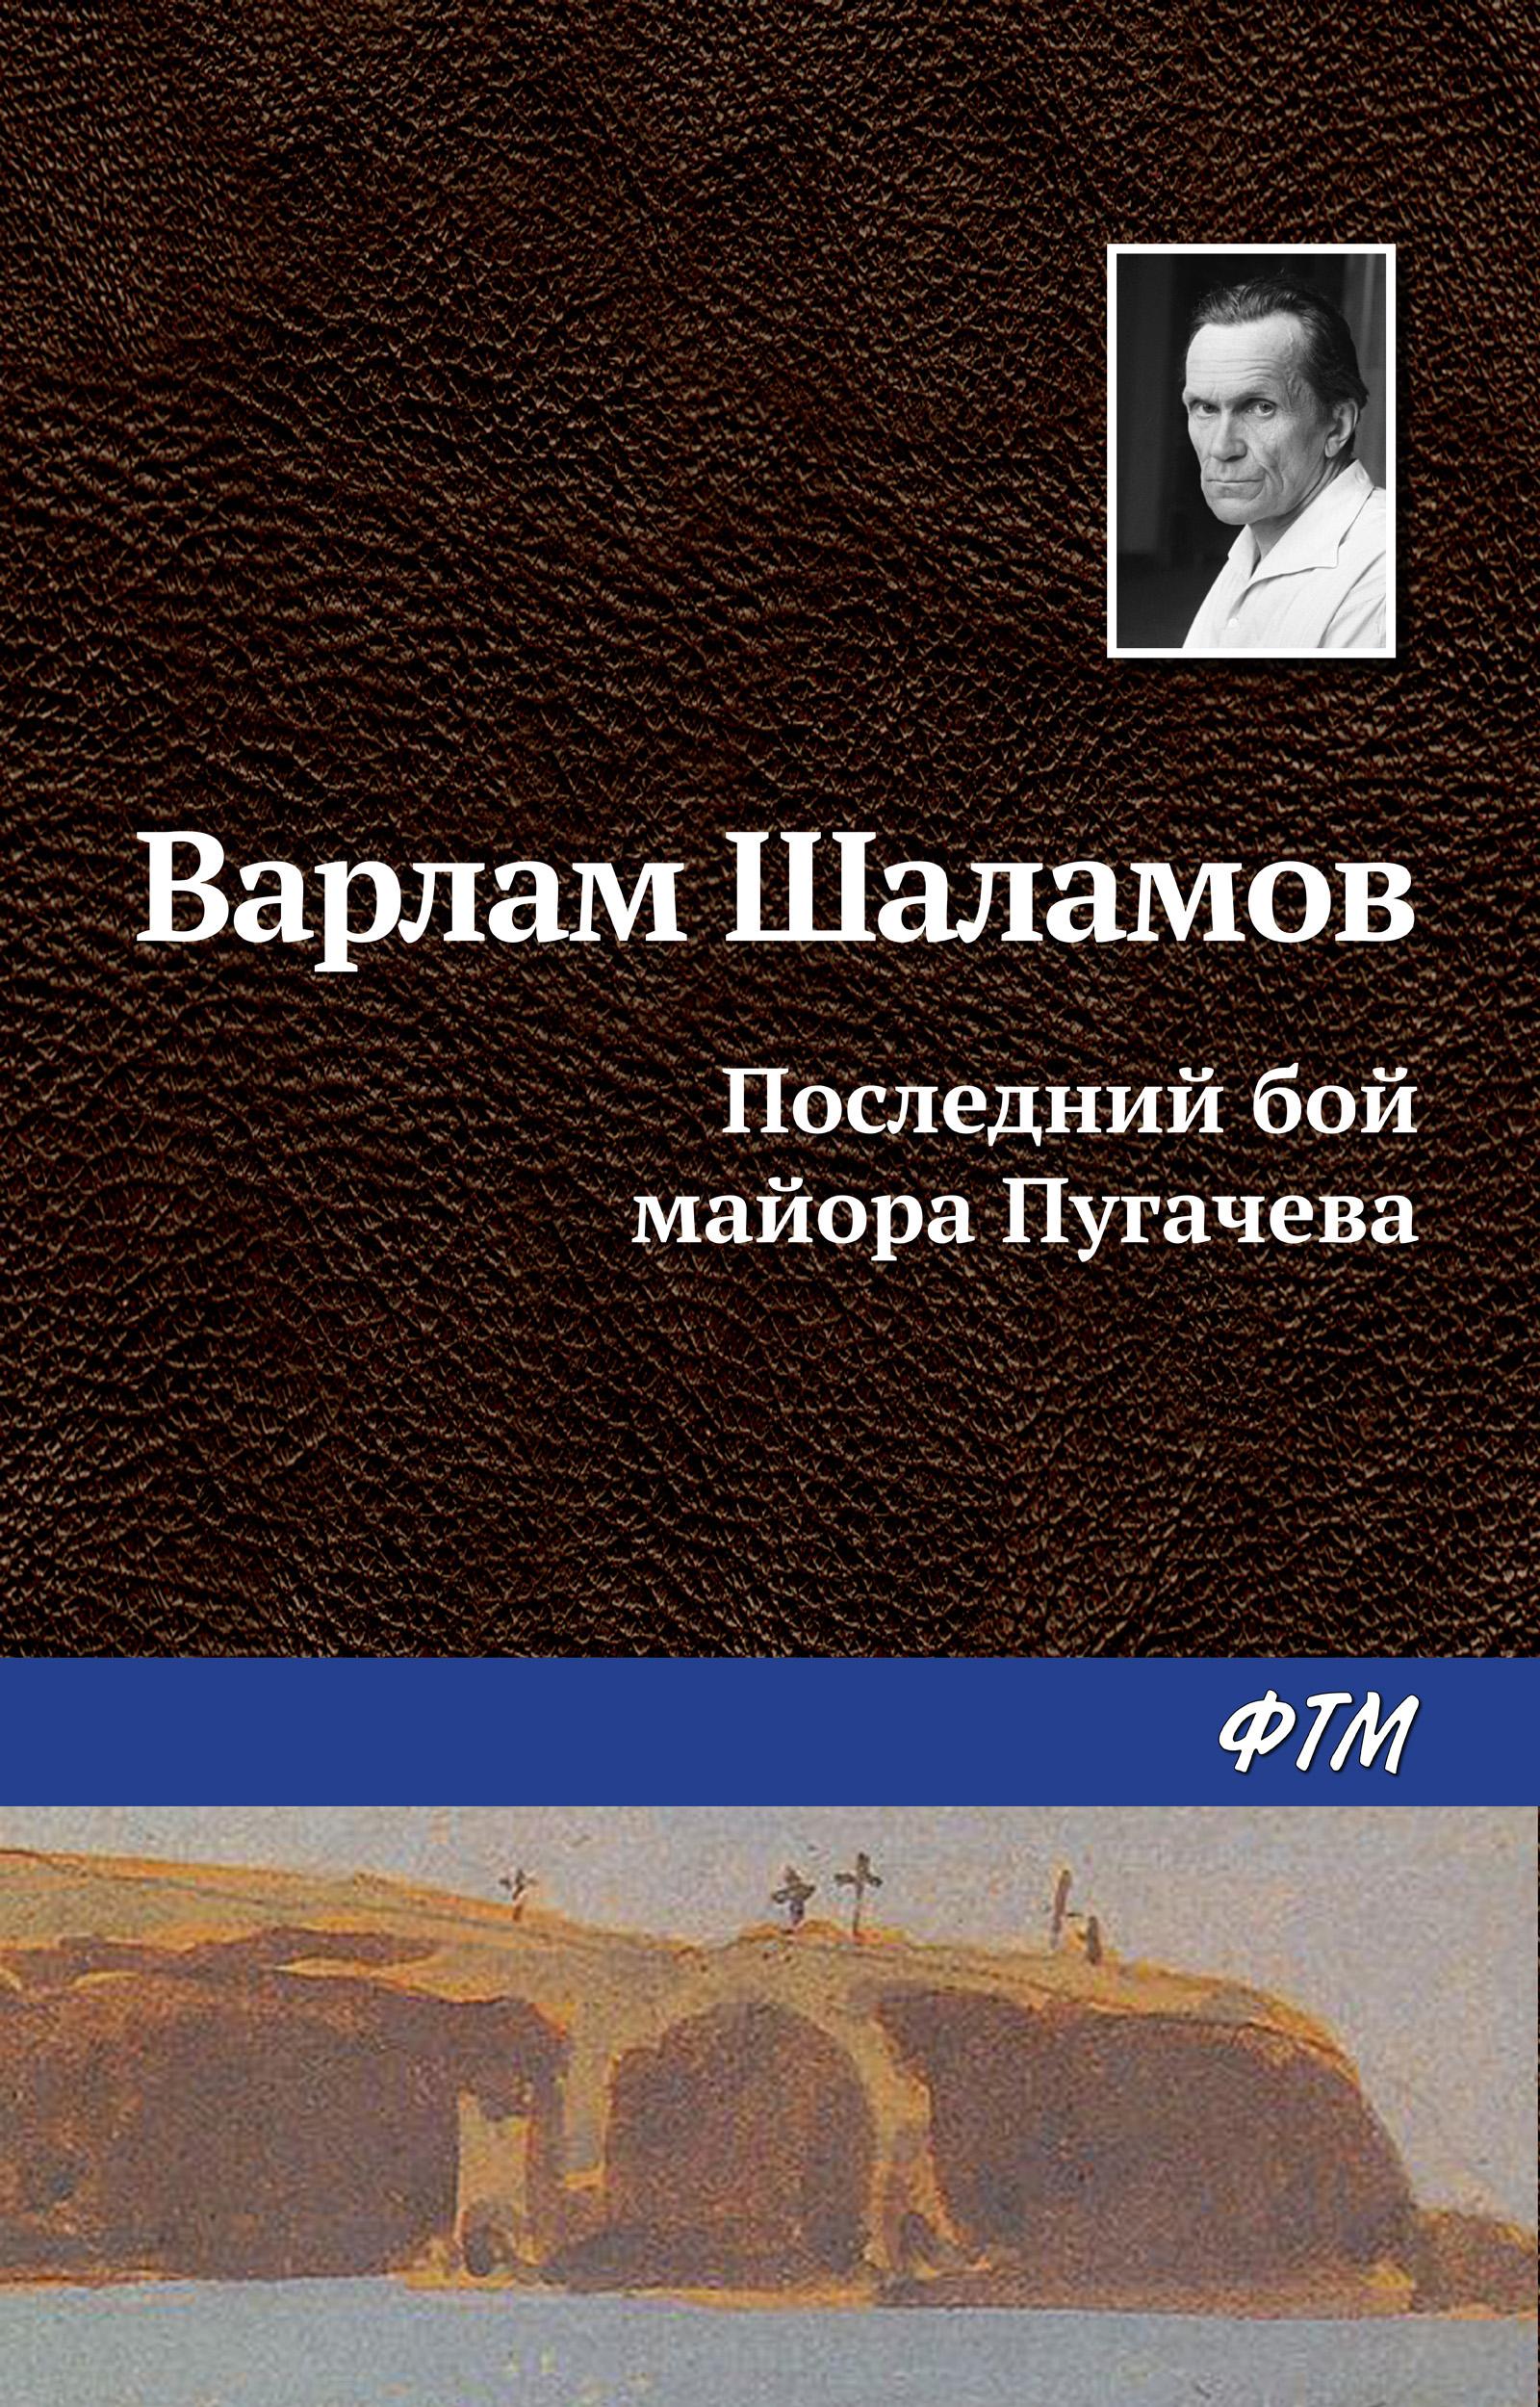 цены Варлам Шаламов Последний бой майора Пугачева